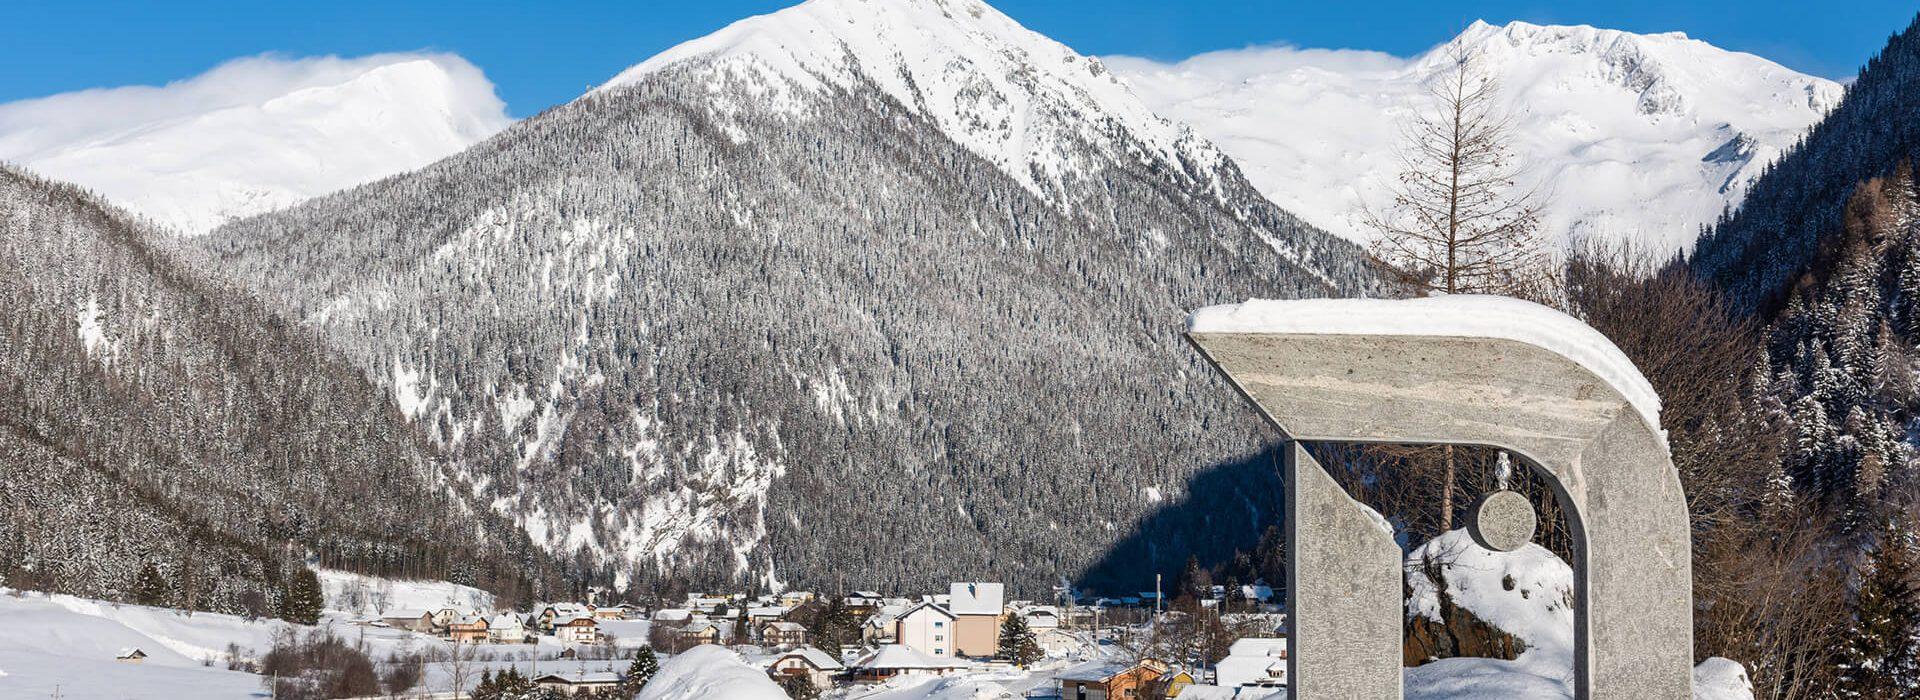 Winter in Mallnitz ©FRANZGERDL